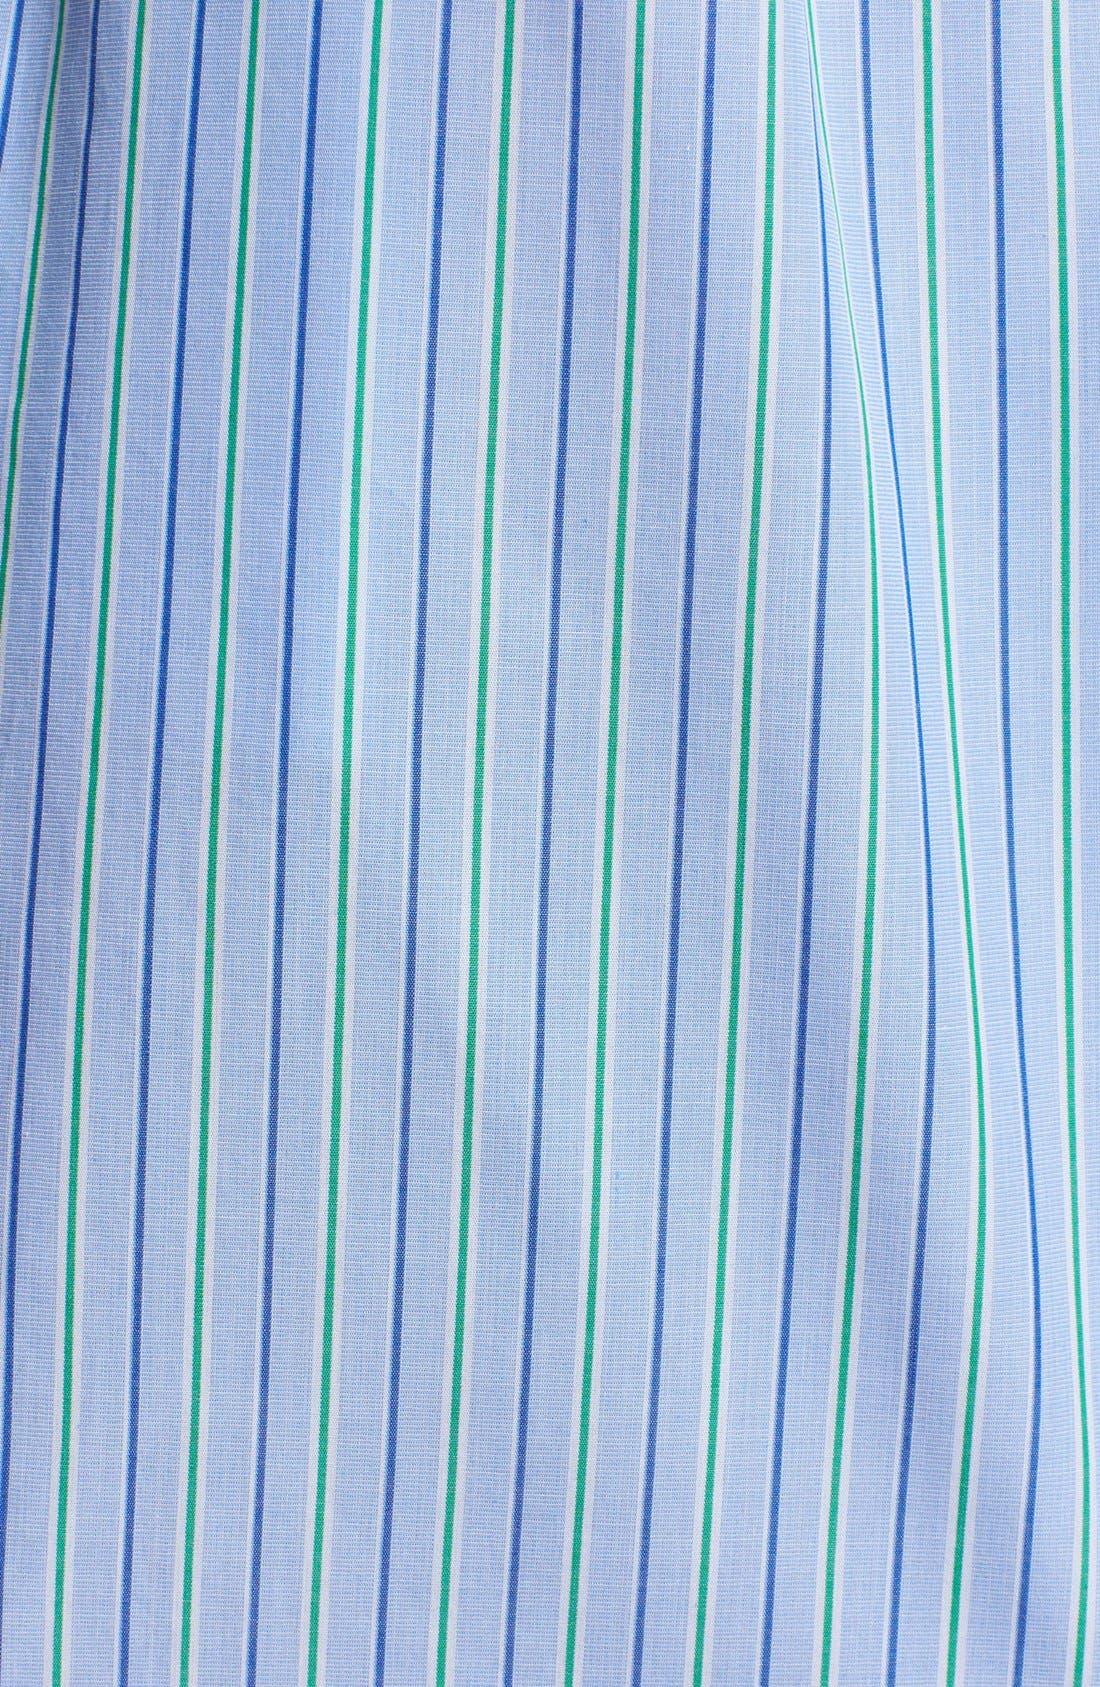 Alternate Image 3  - Polo Ralph Lauren Cotton Pajama Pants